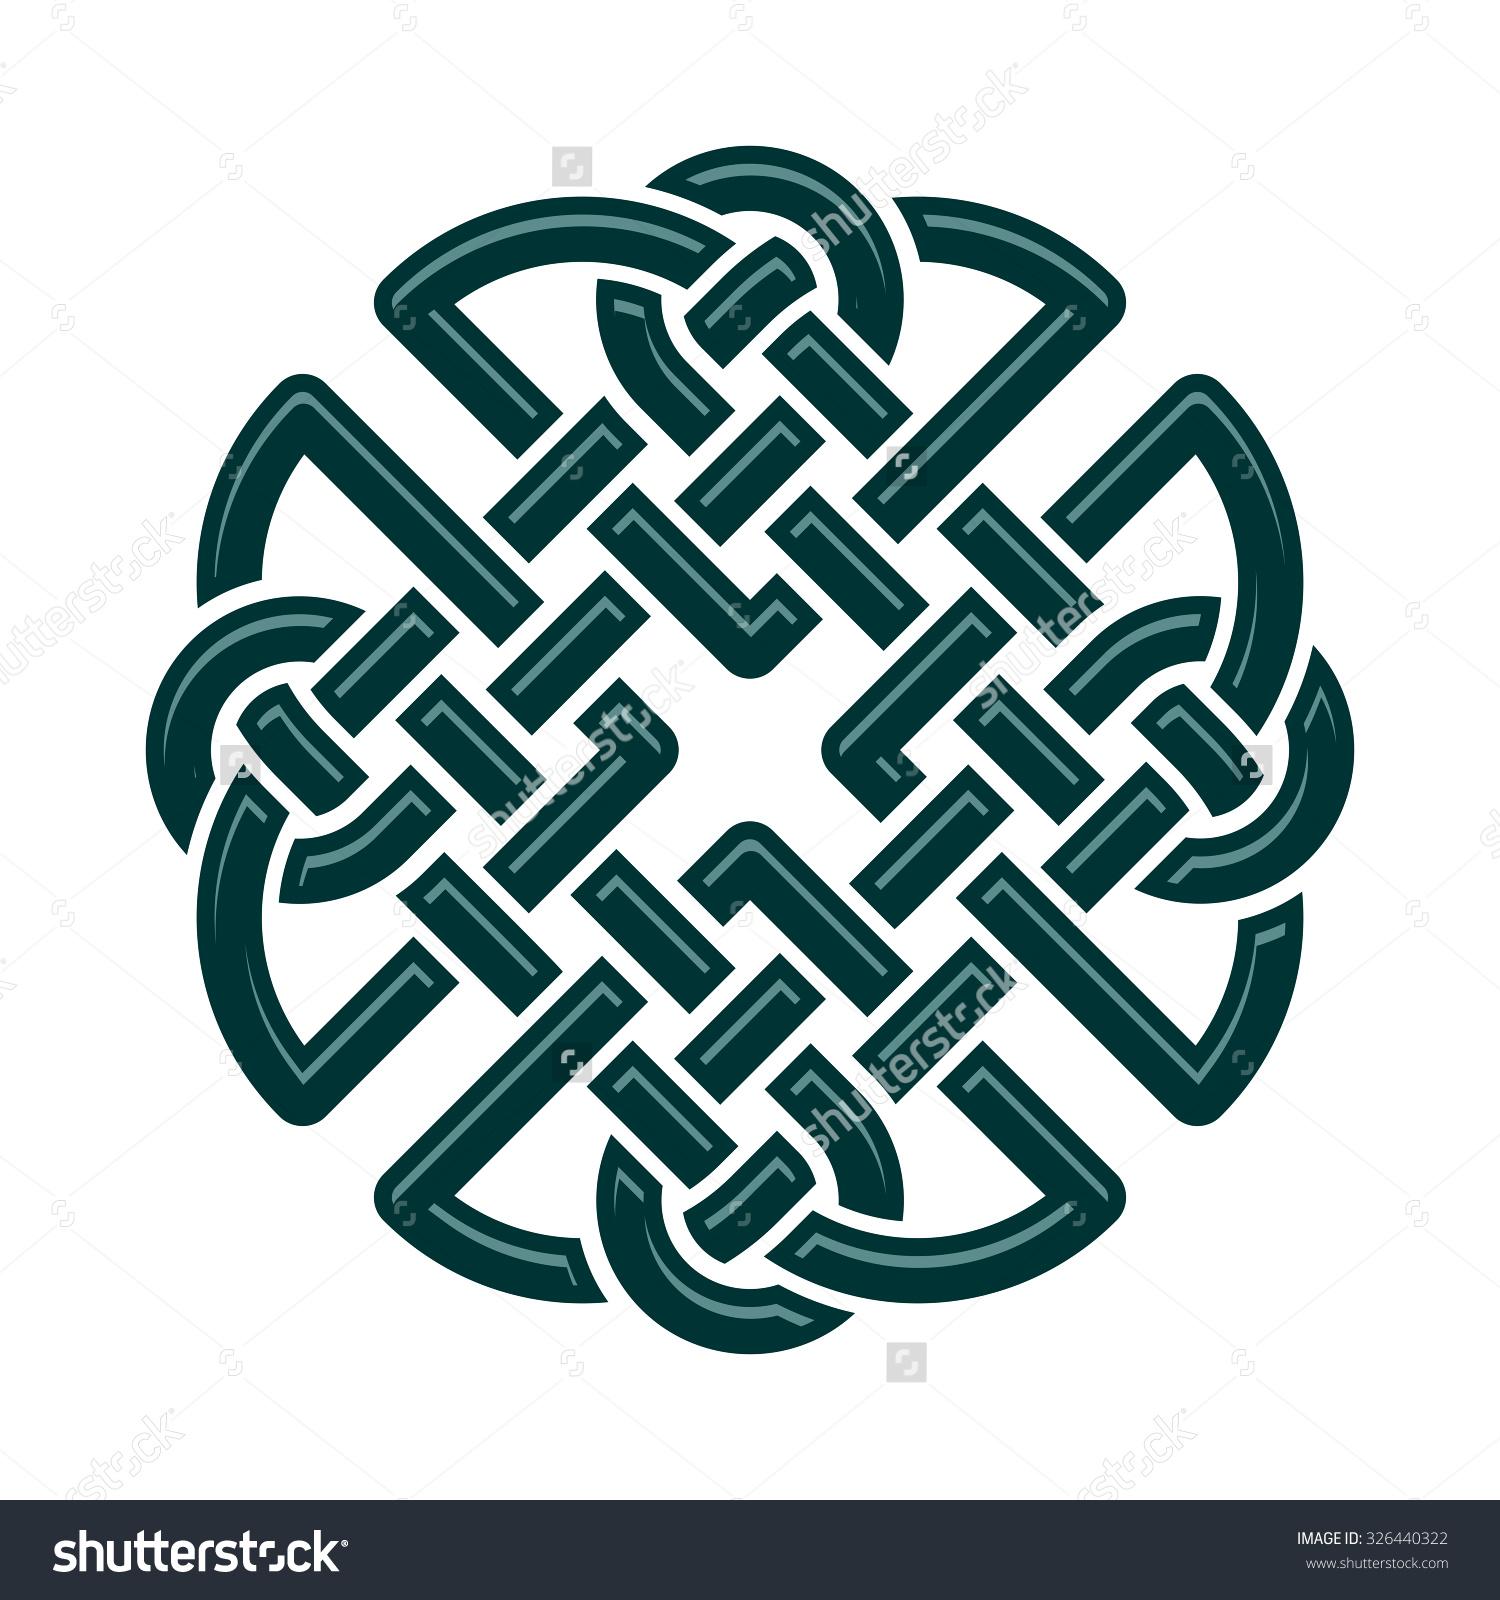 Symbol for Strength - Fotolip